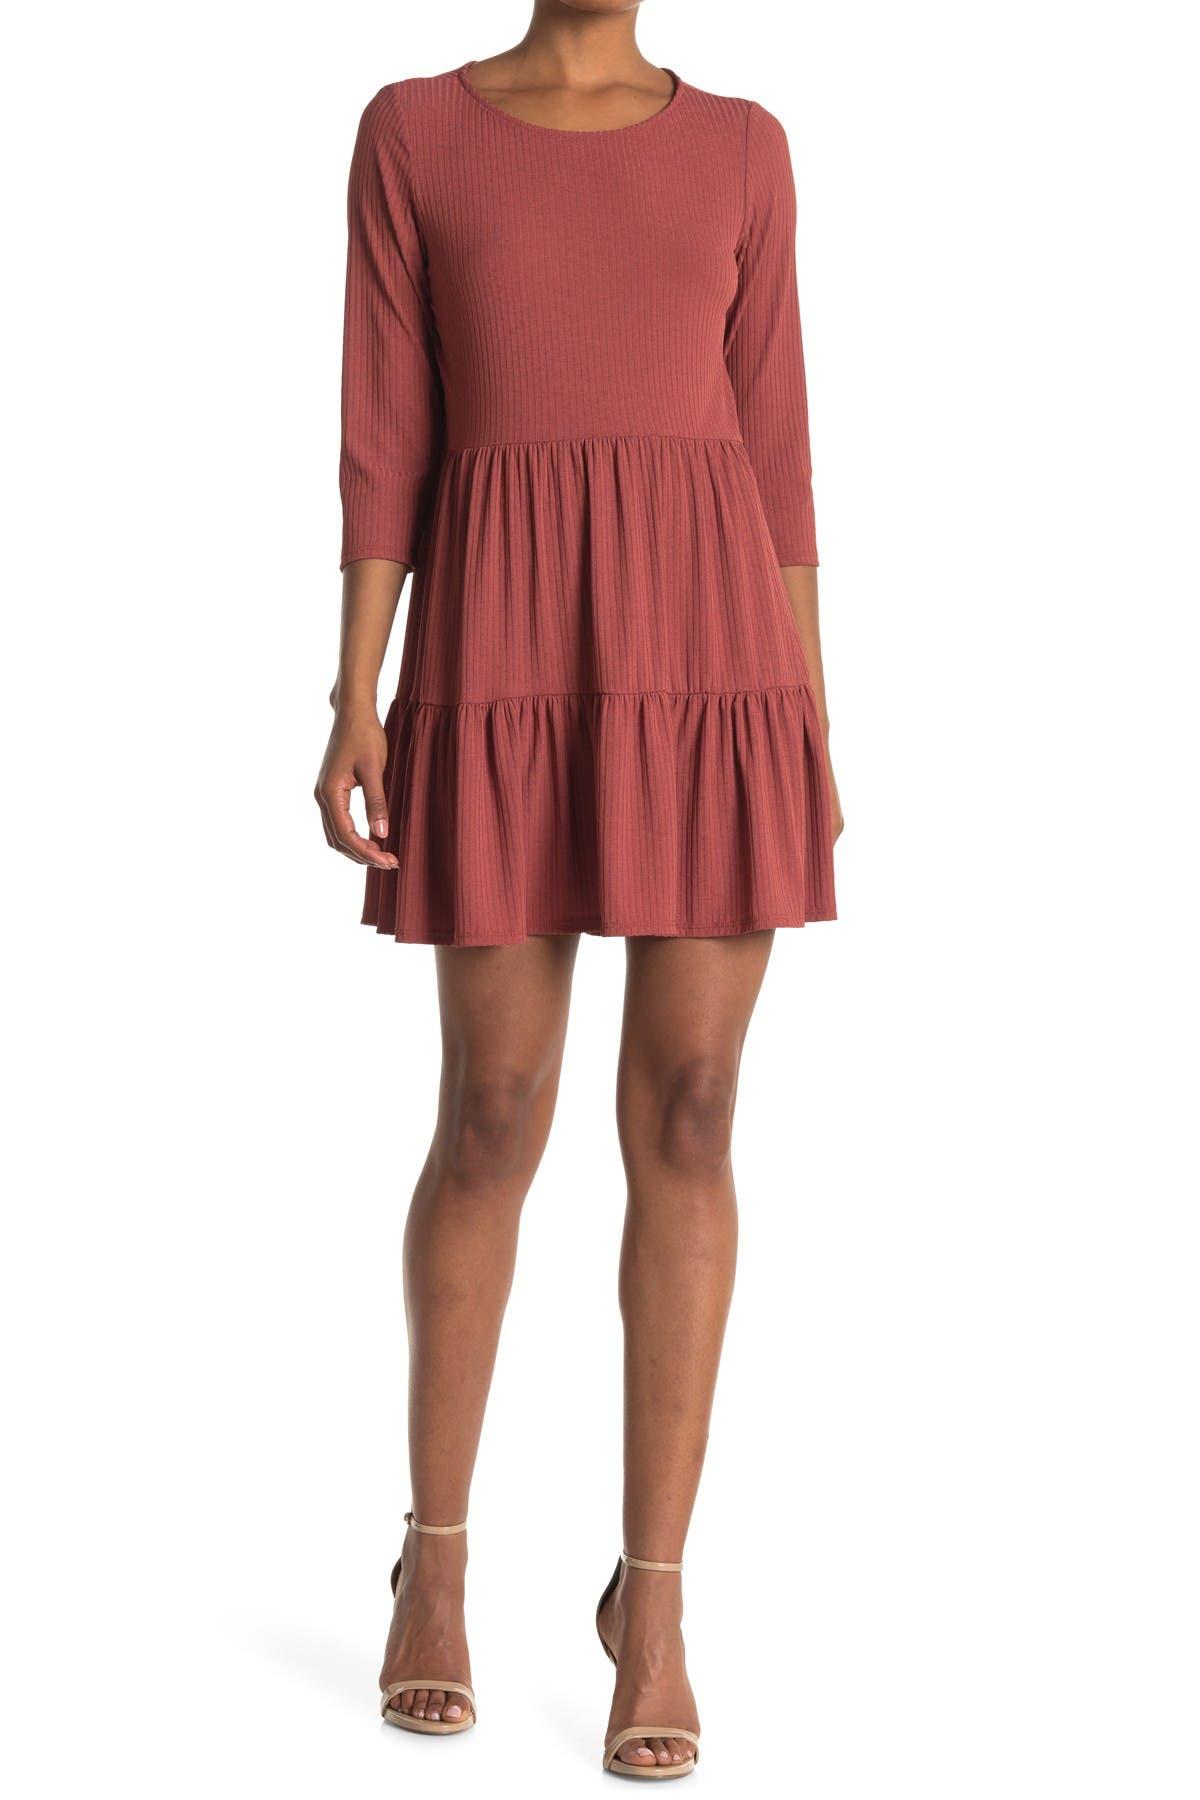 Image of TASH + SOPHIE Long Sleeve Tiered Dress